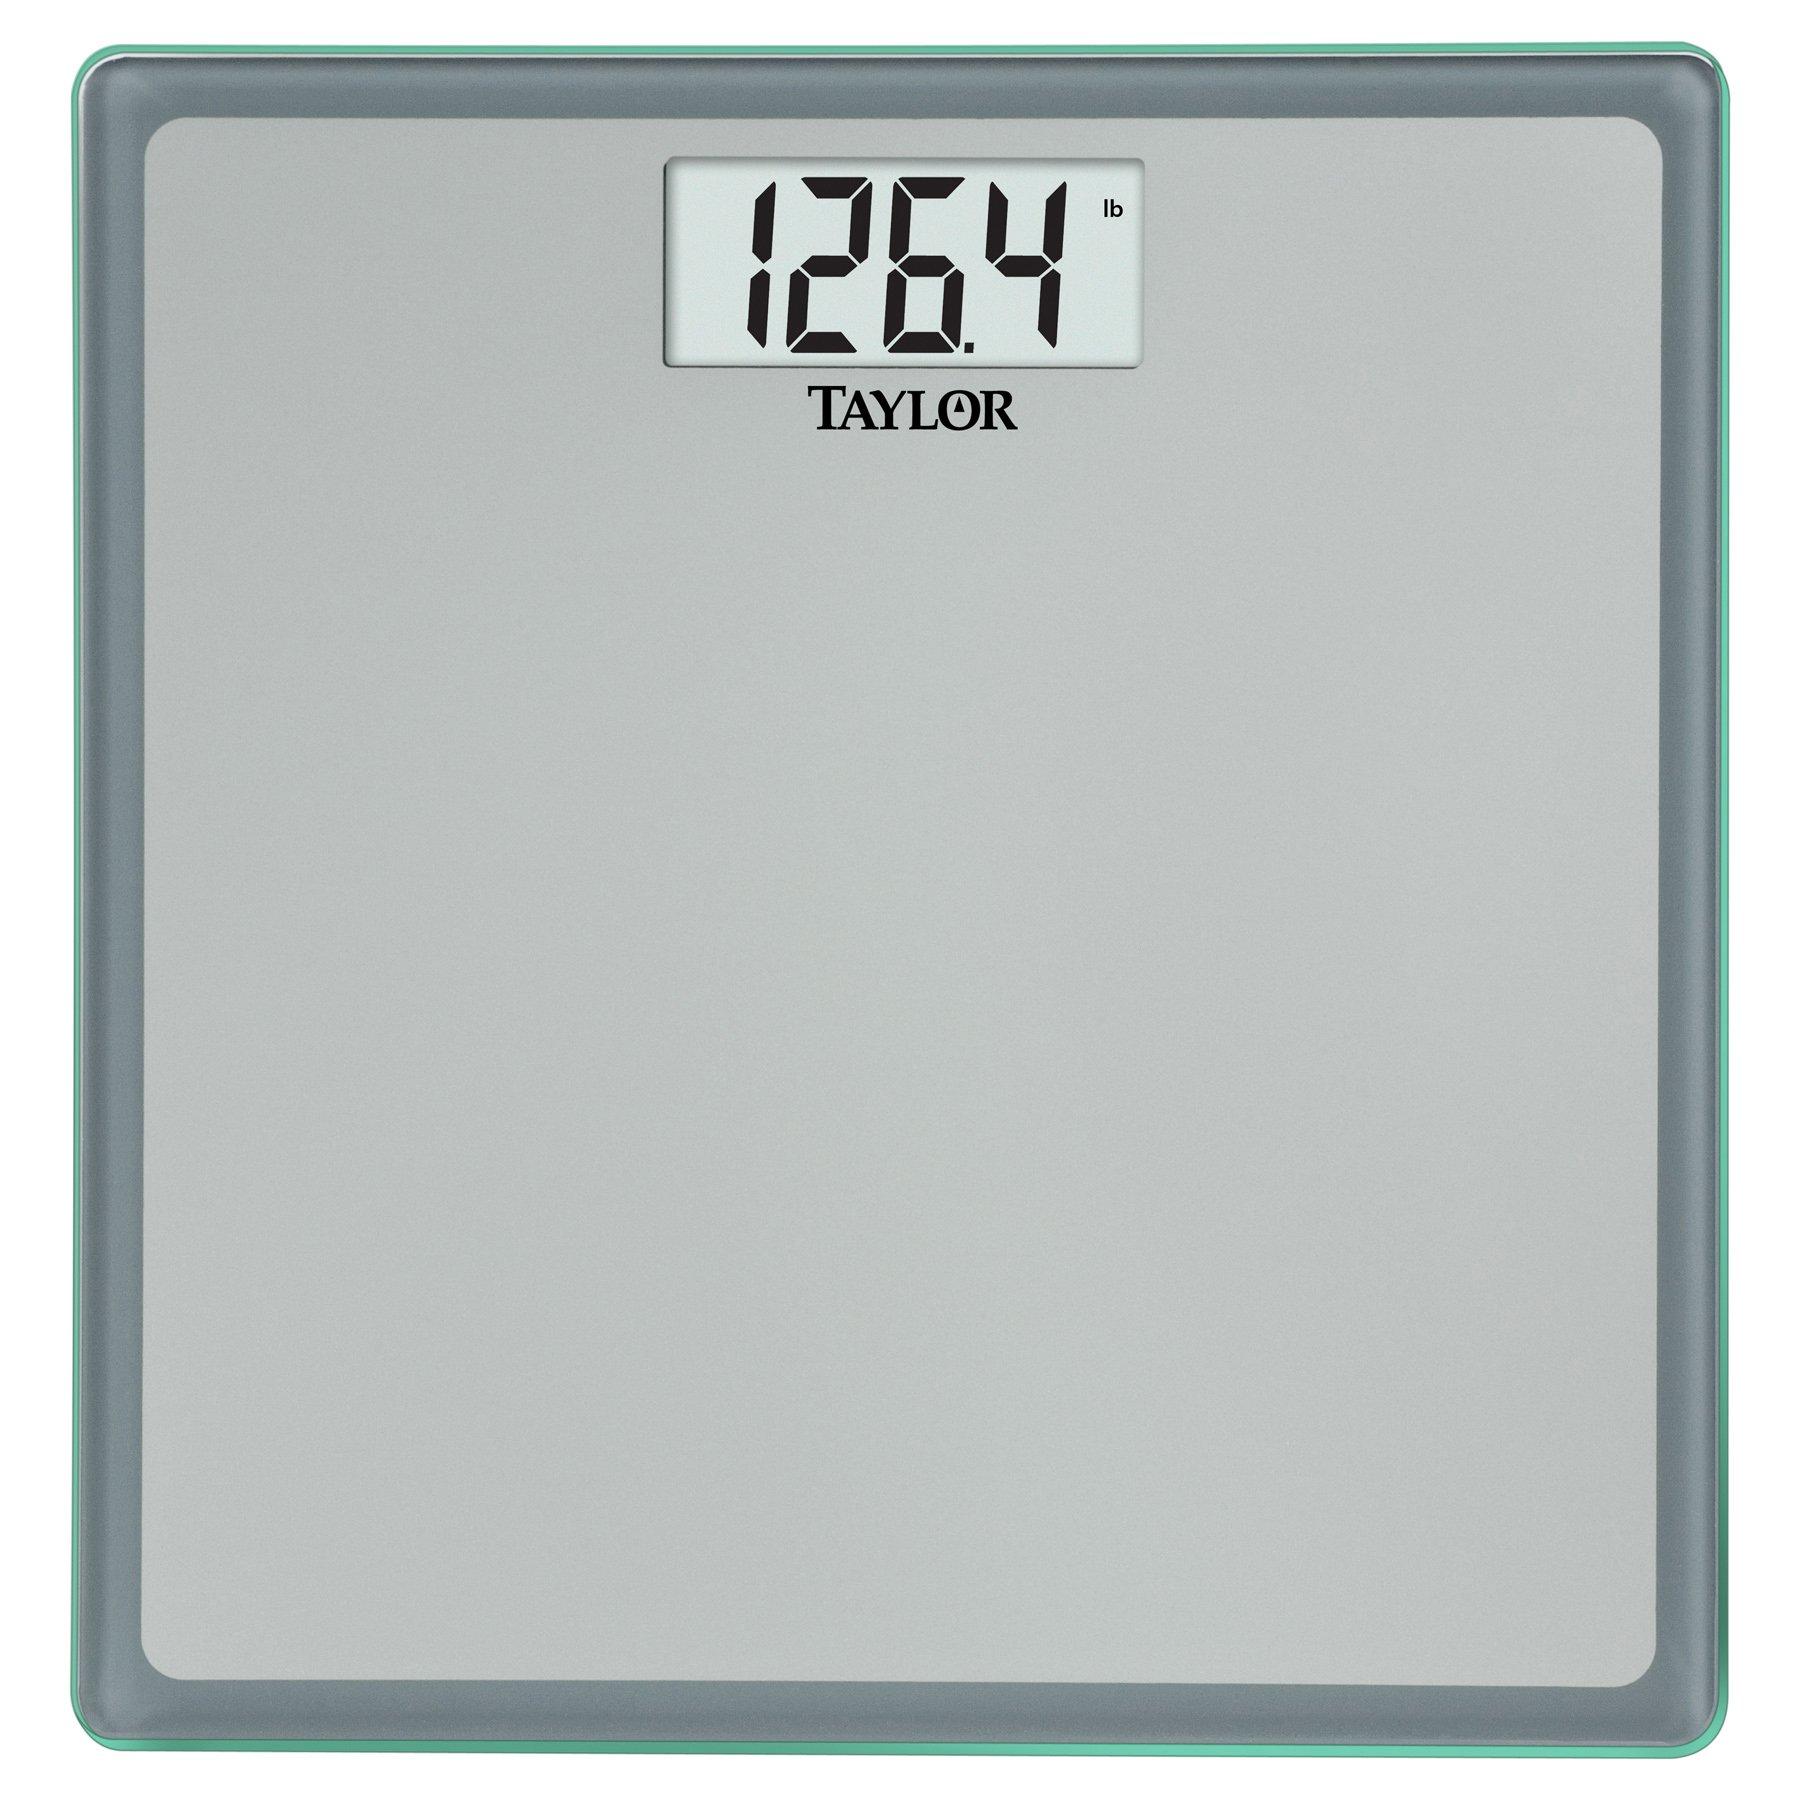 Taylor Precision Products Glass Digital Bath Scale (Grey/Blue) by Taylor Precision Products